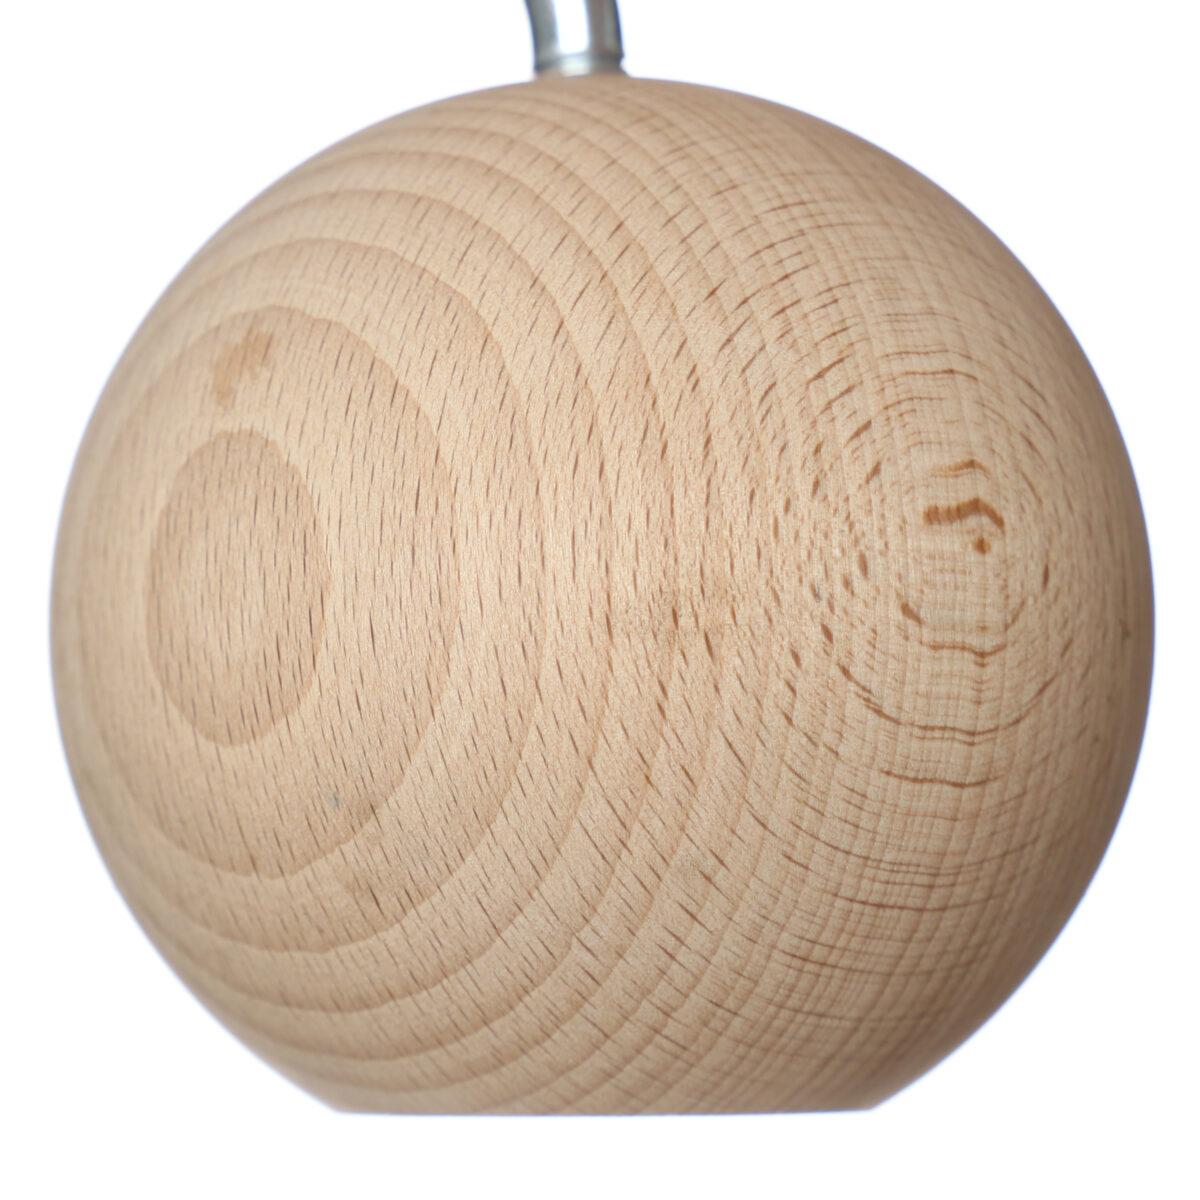 TOROZ. PL Kula drewniana